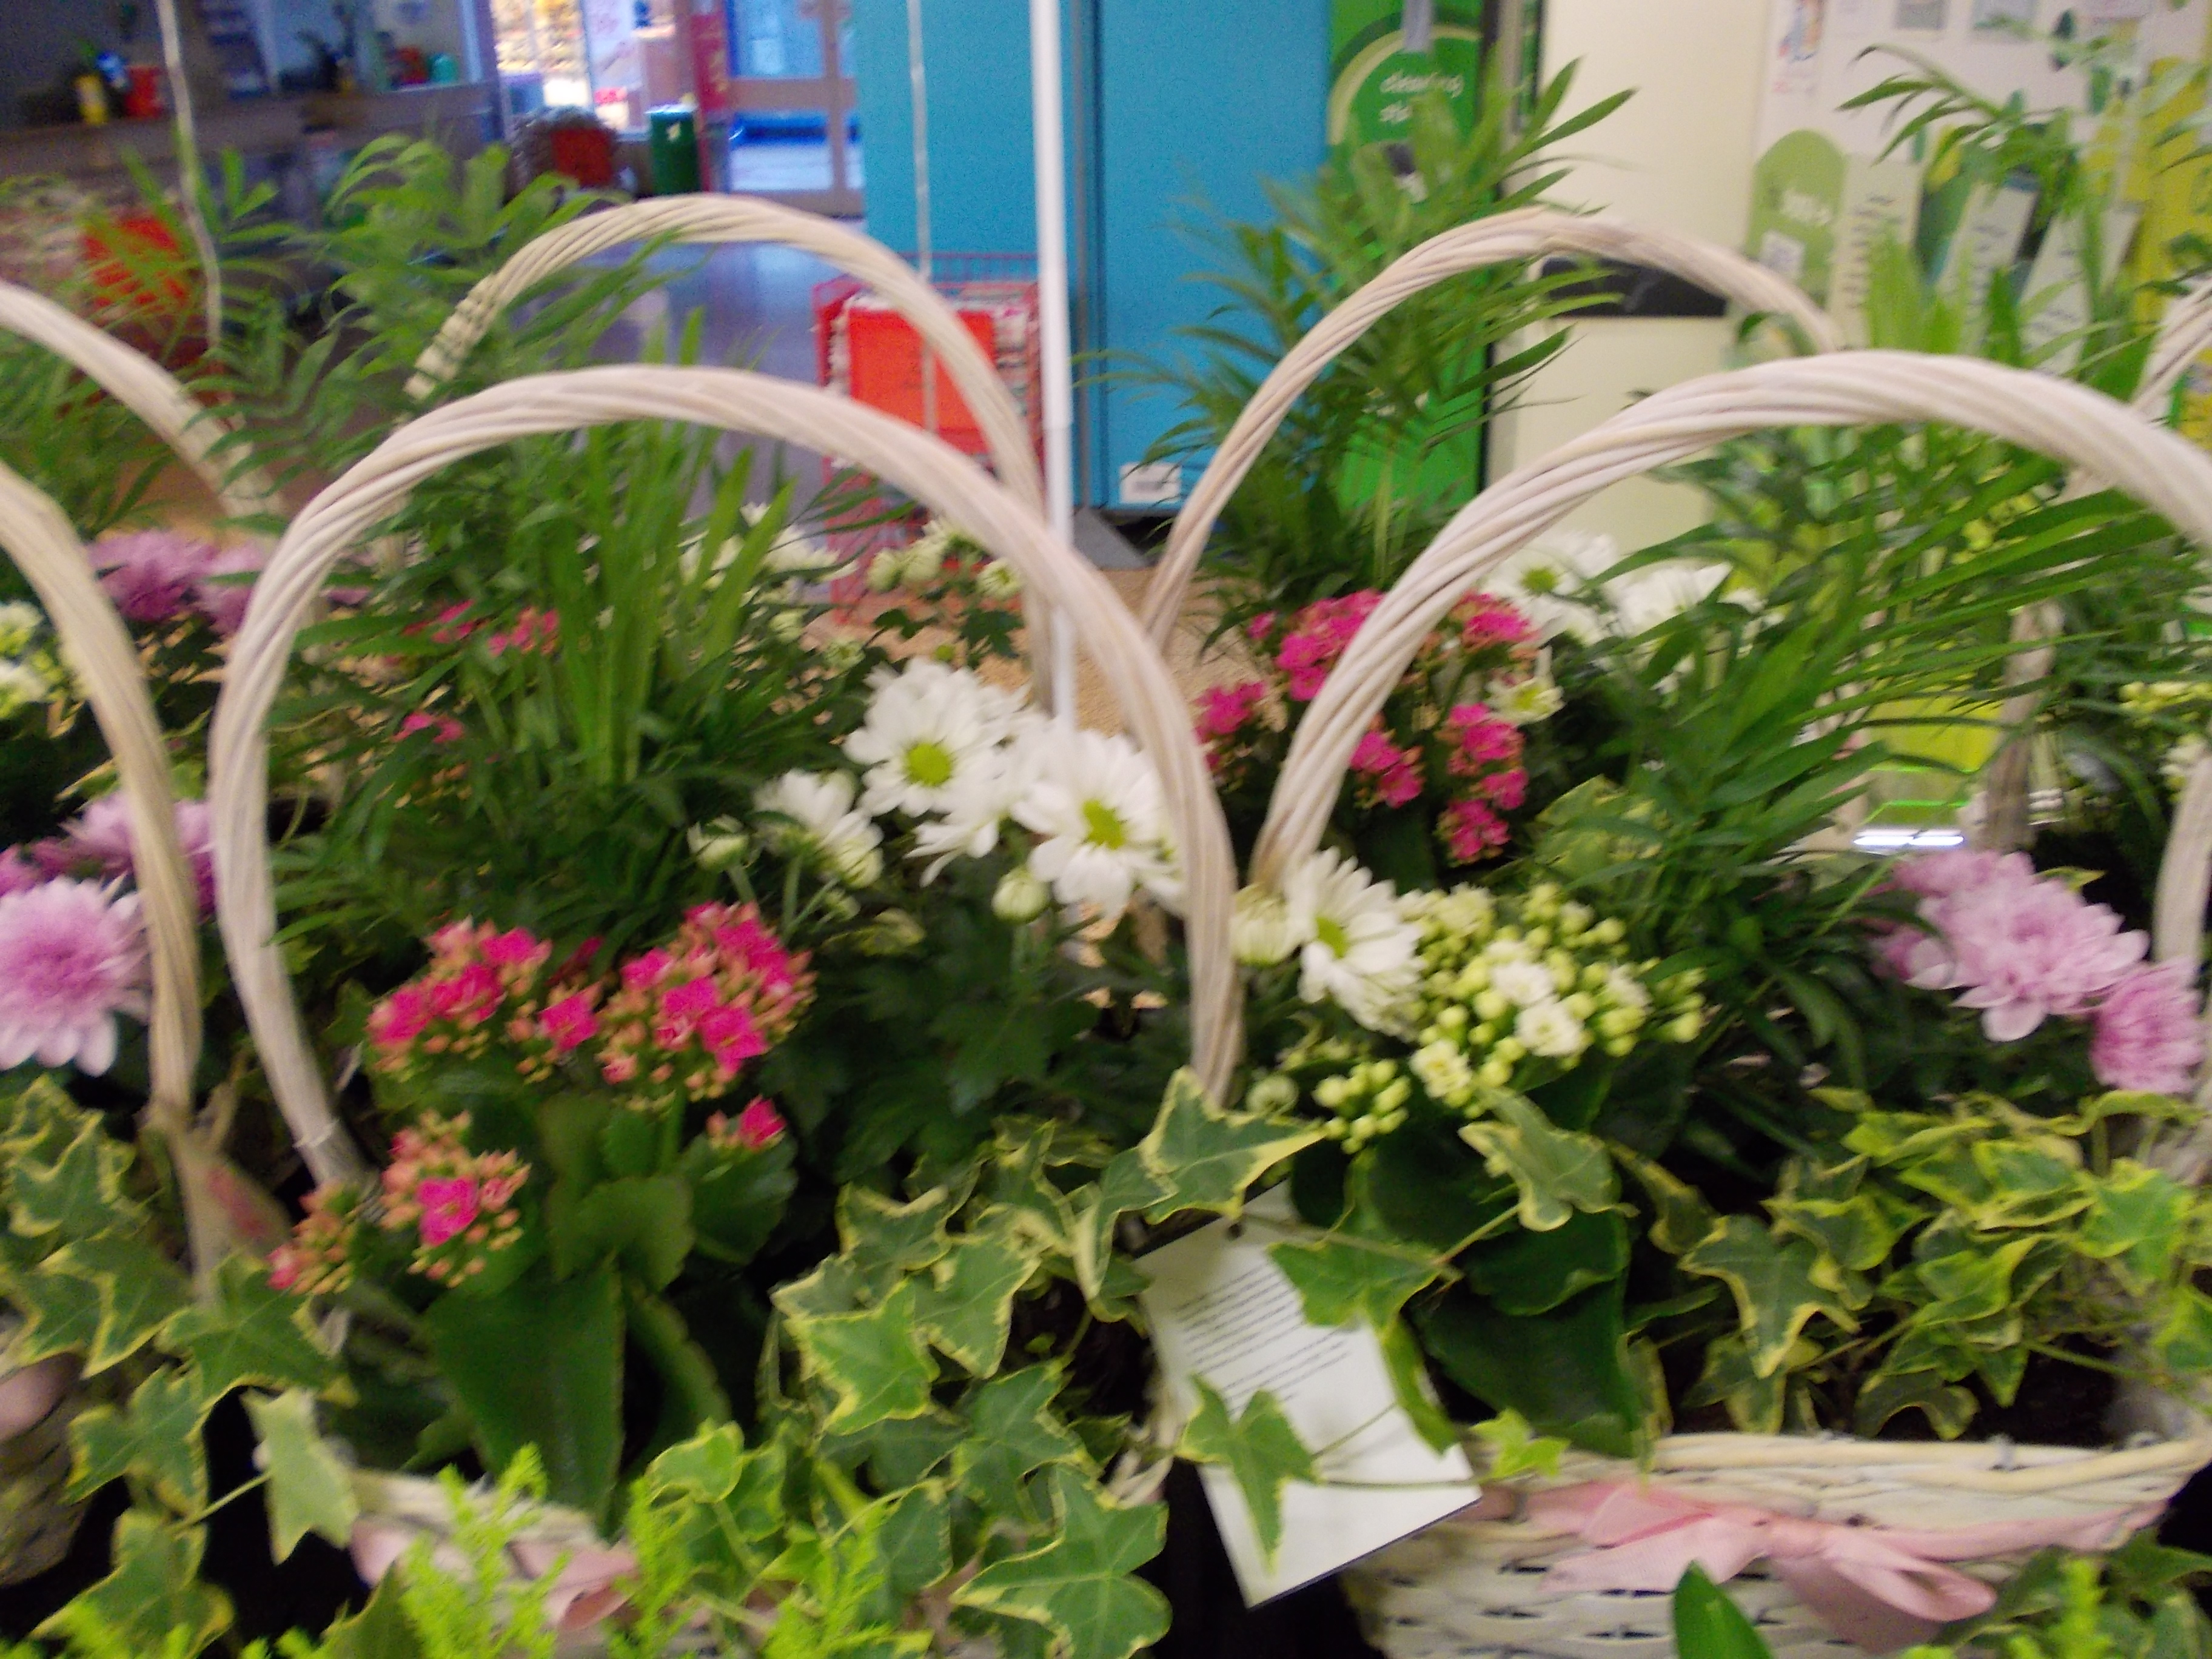 indoor plants asda gallery